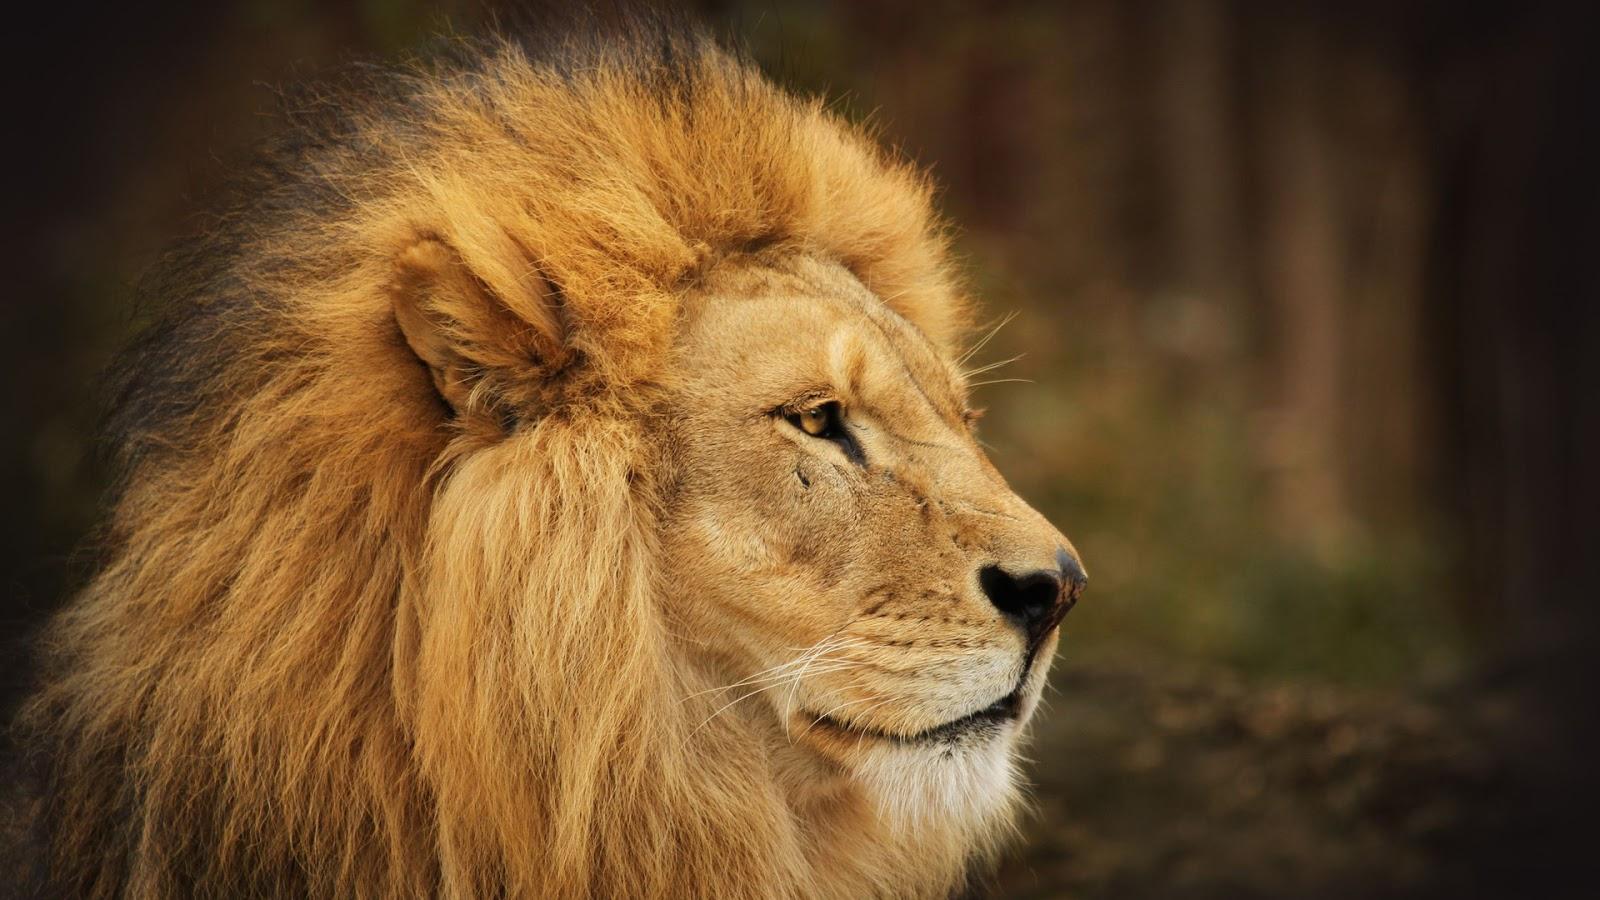 hd wallpapers beautiful lion